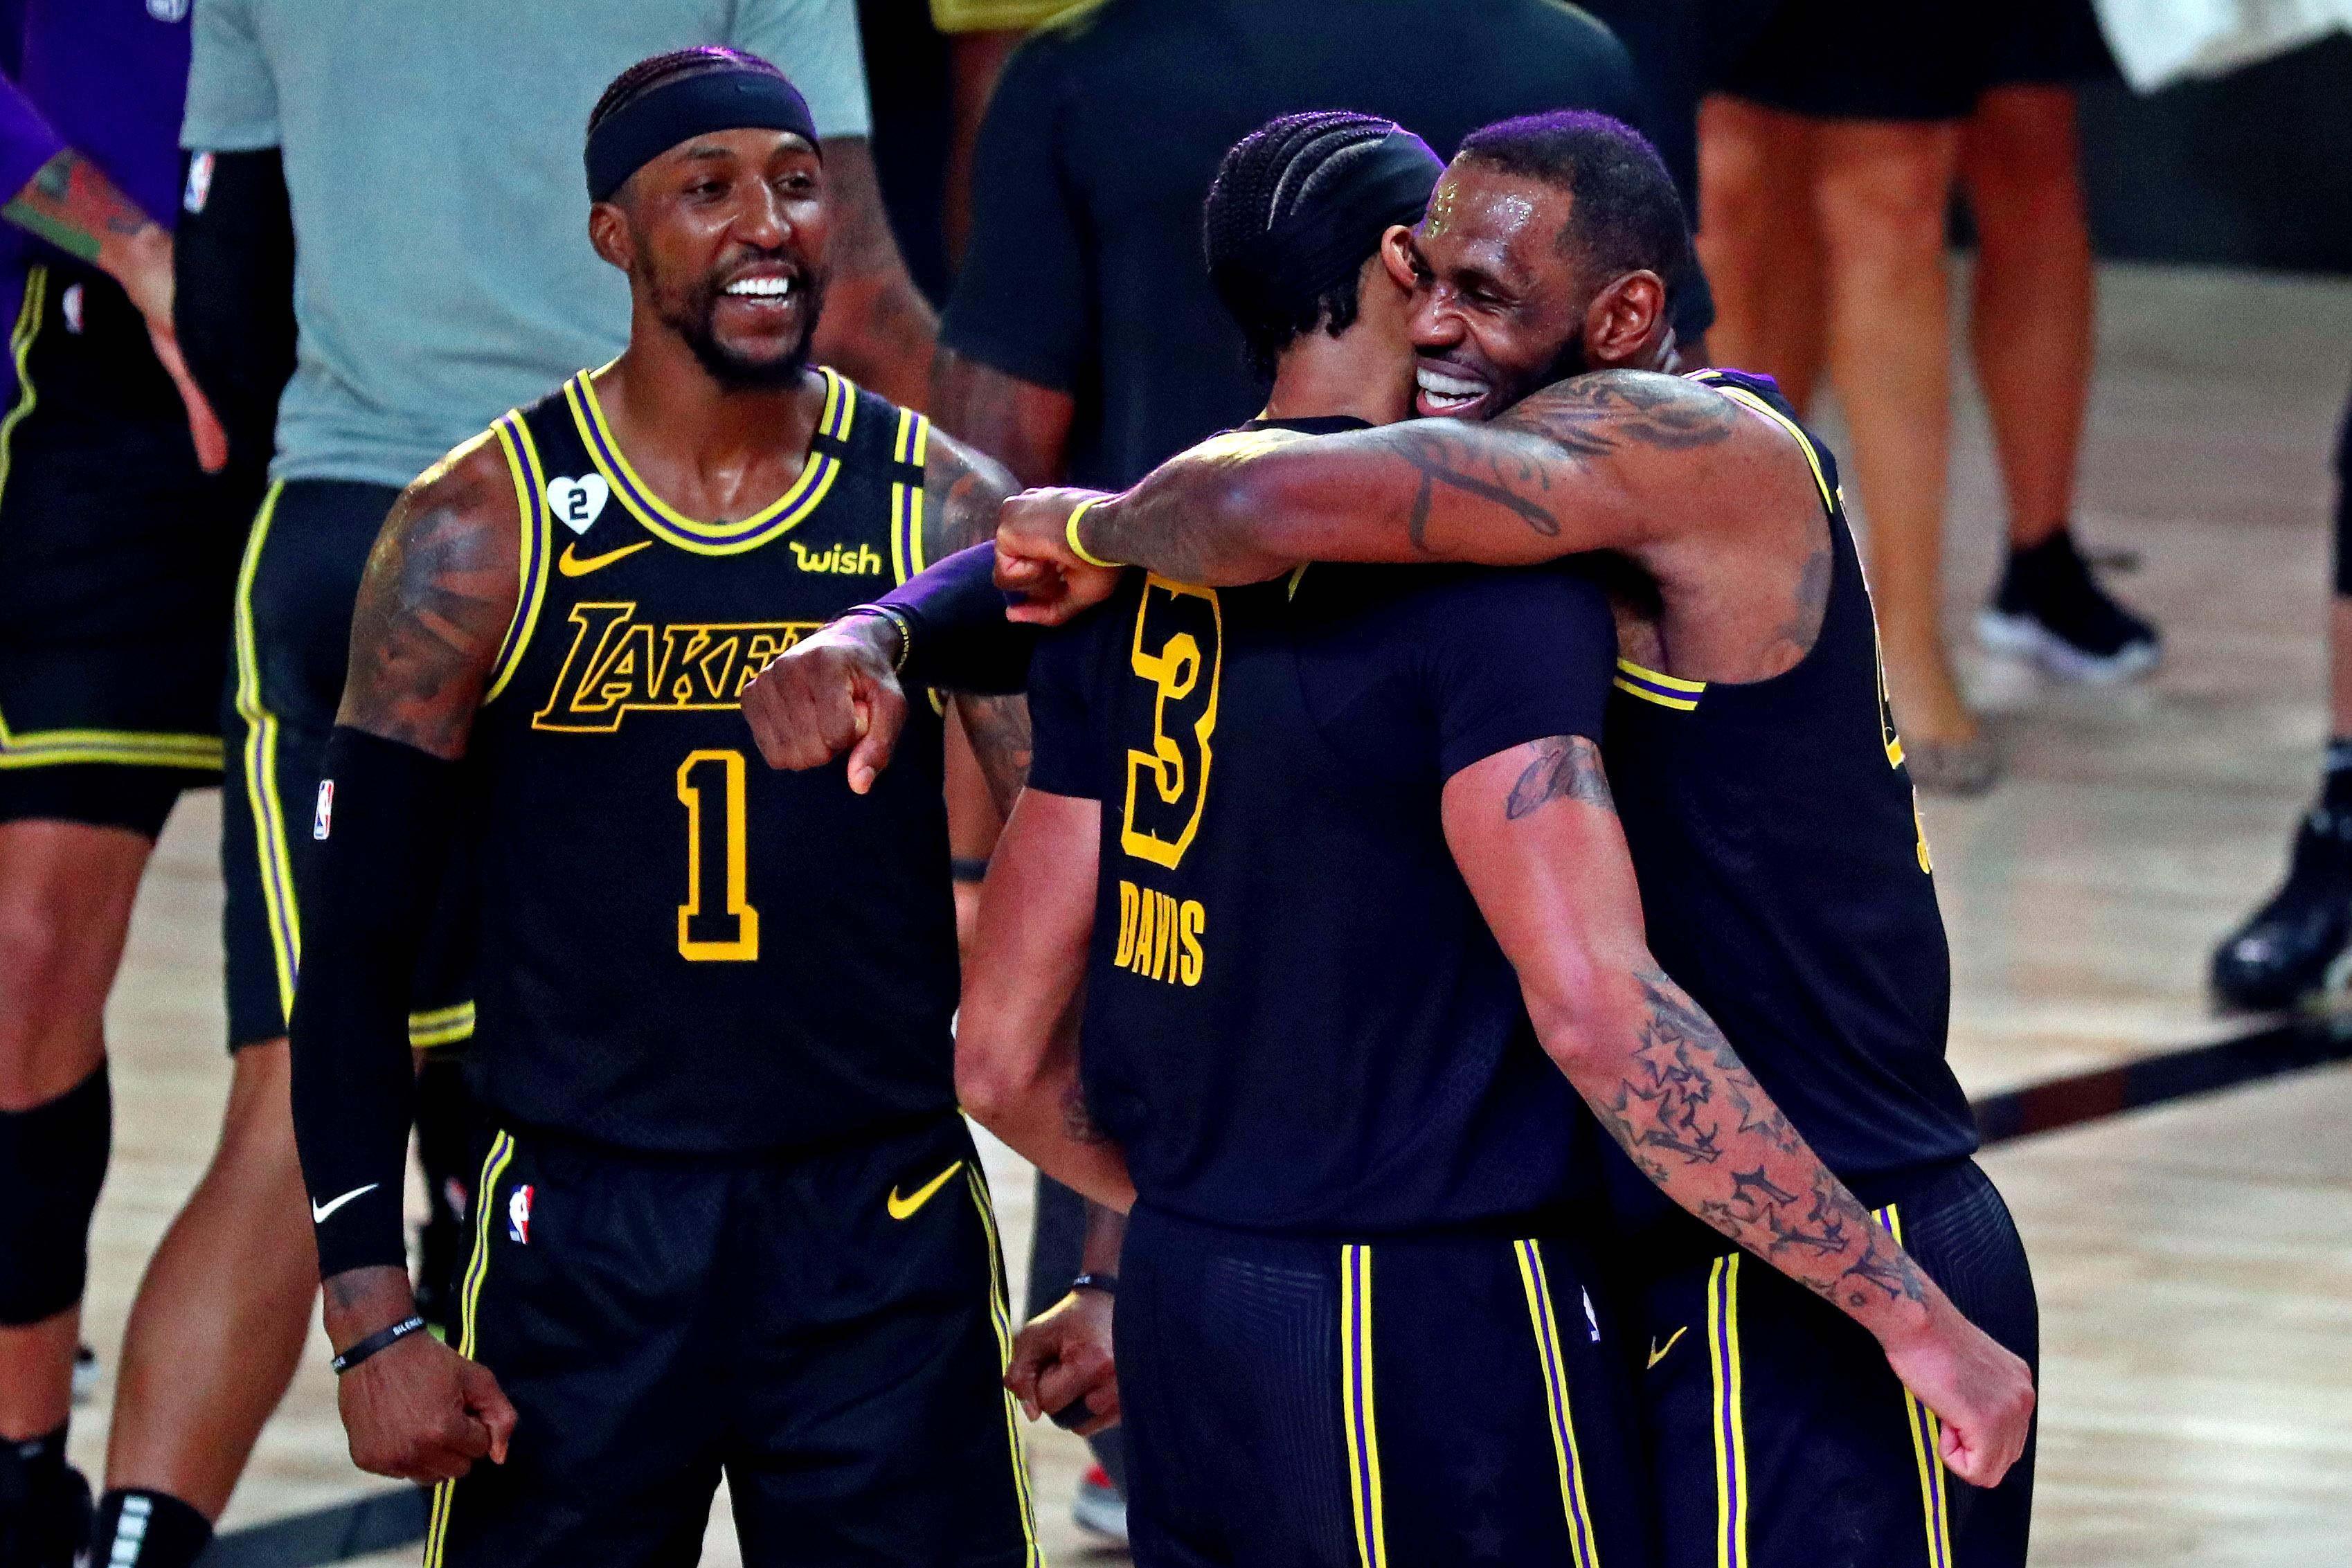 The Top 6 NBA Players So Far in 2020